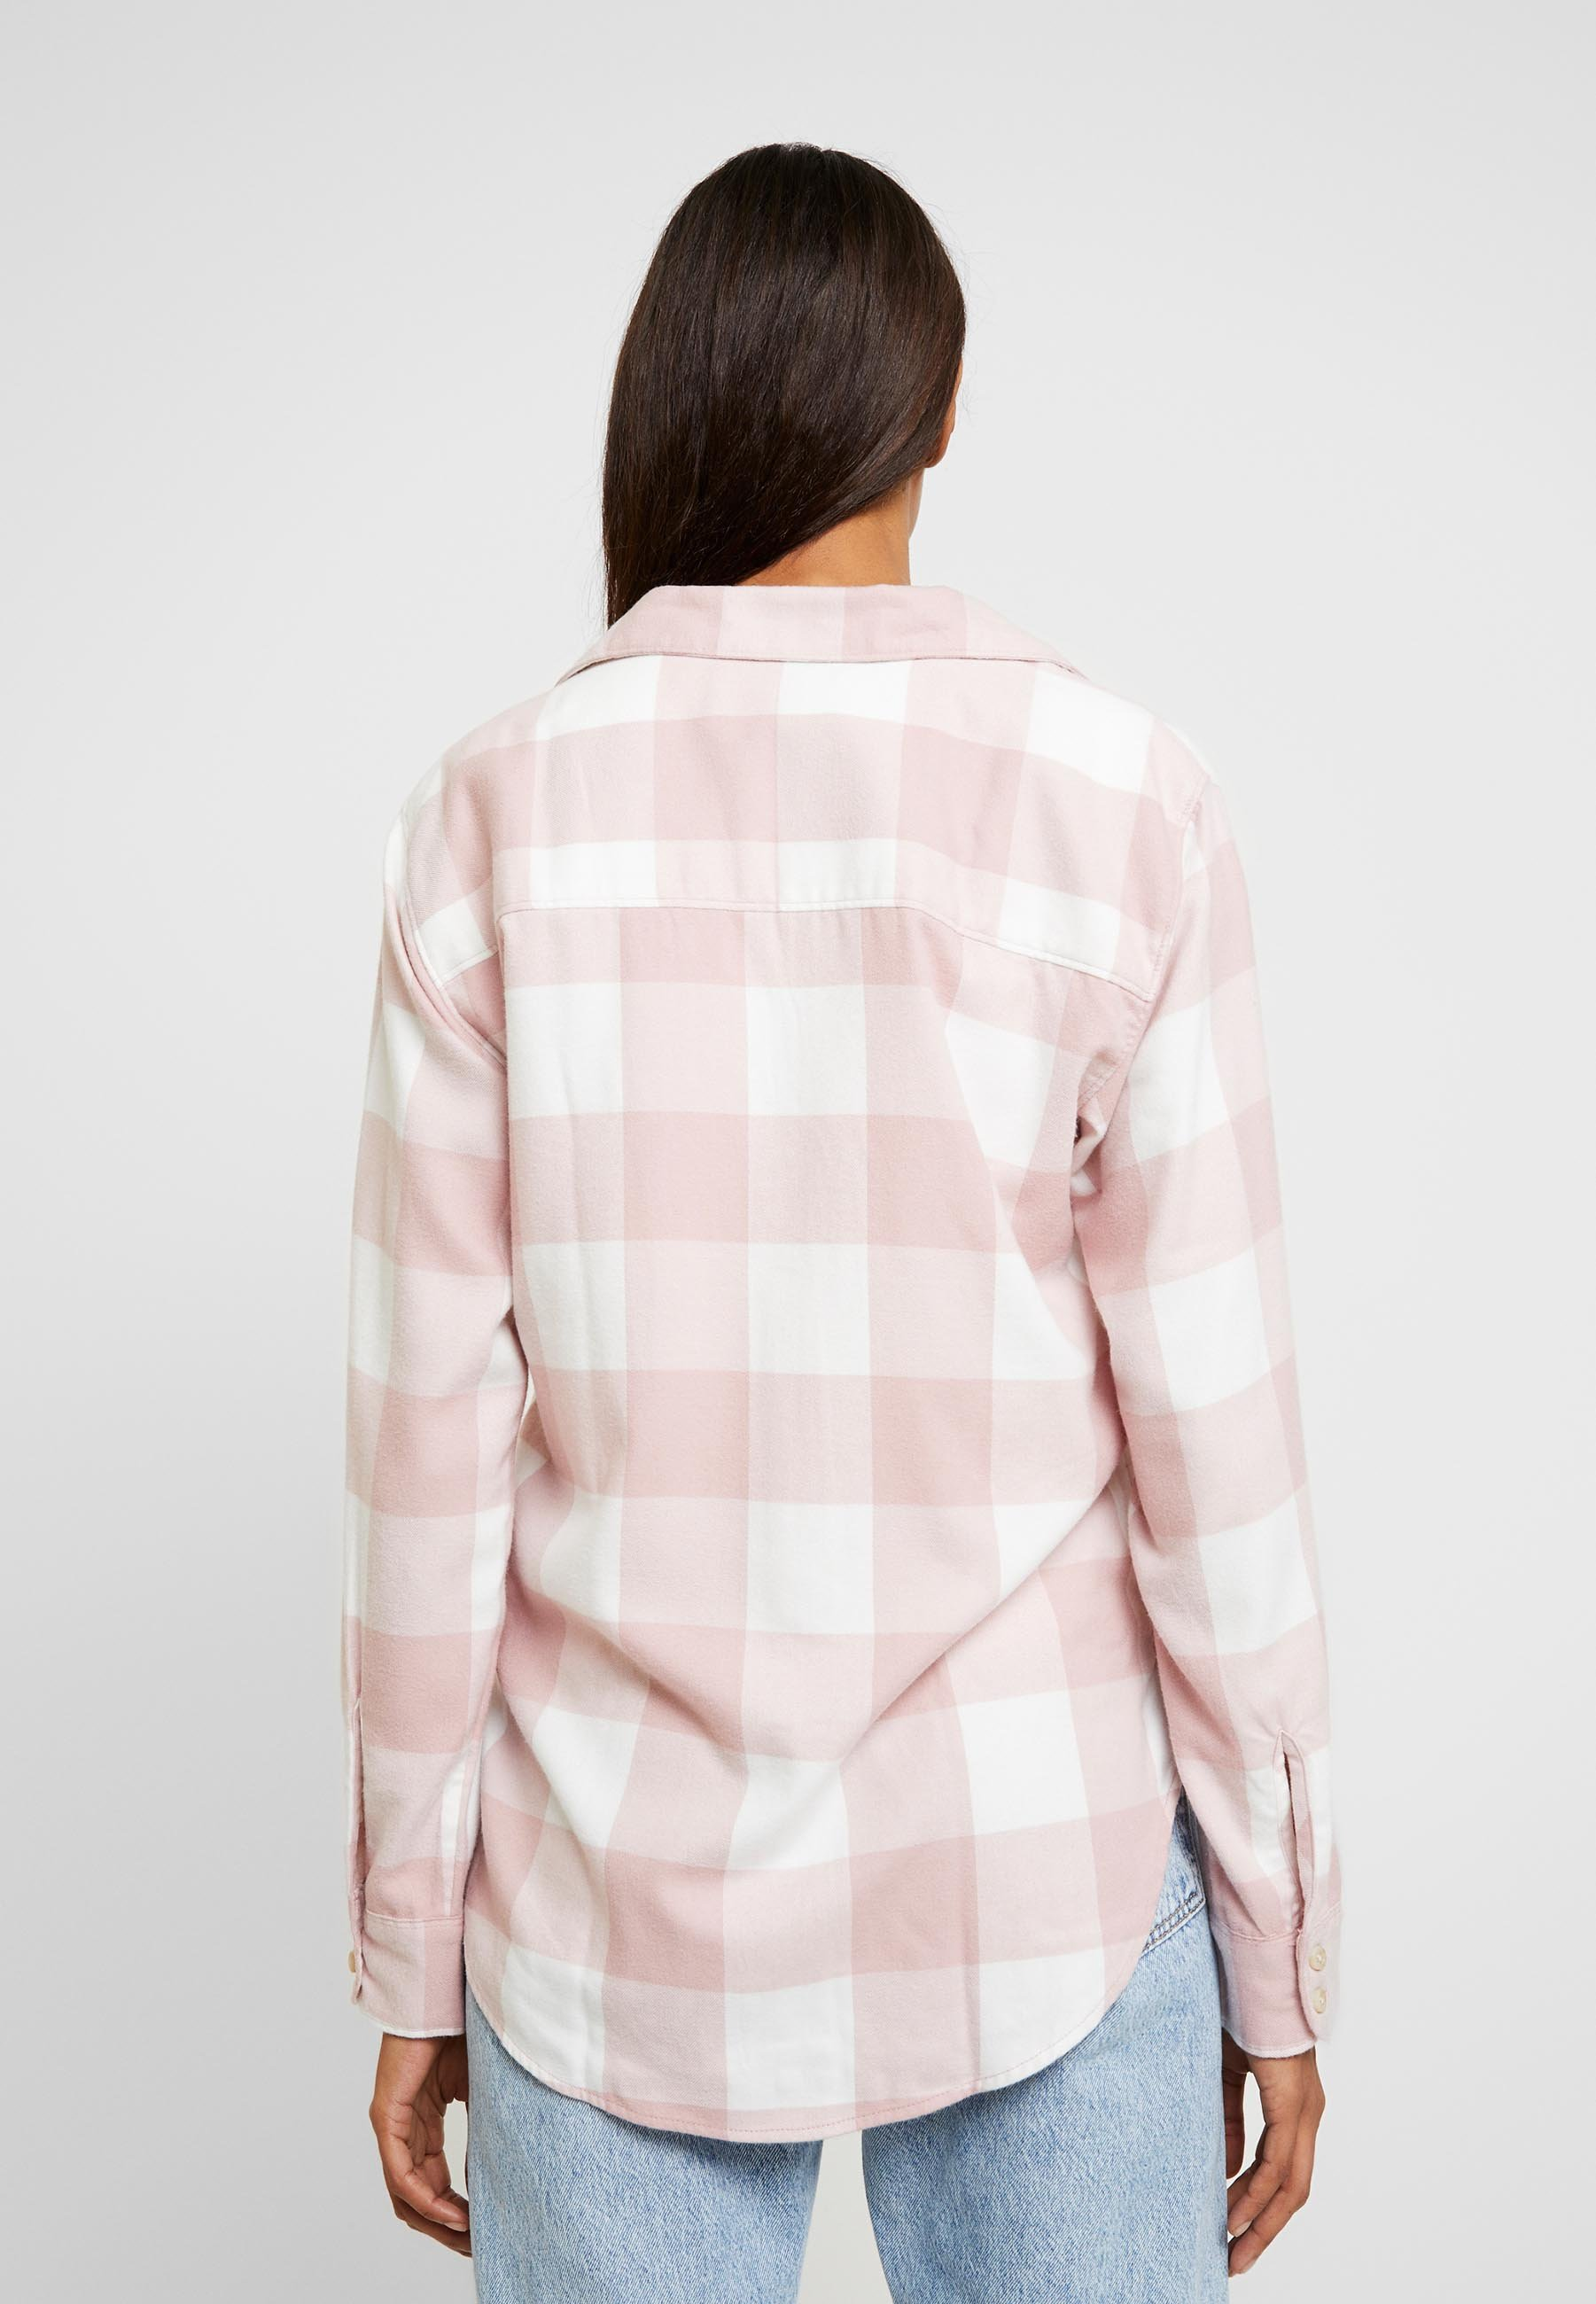 Abercrombie & Fitch Skjorte - light pink